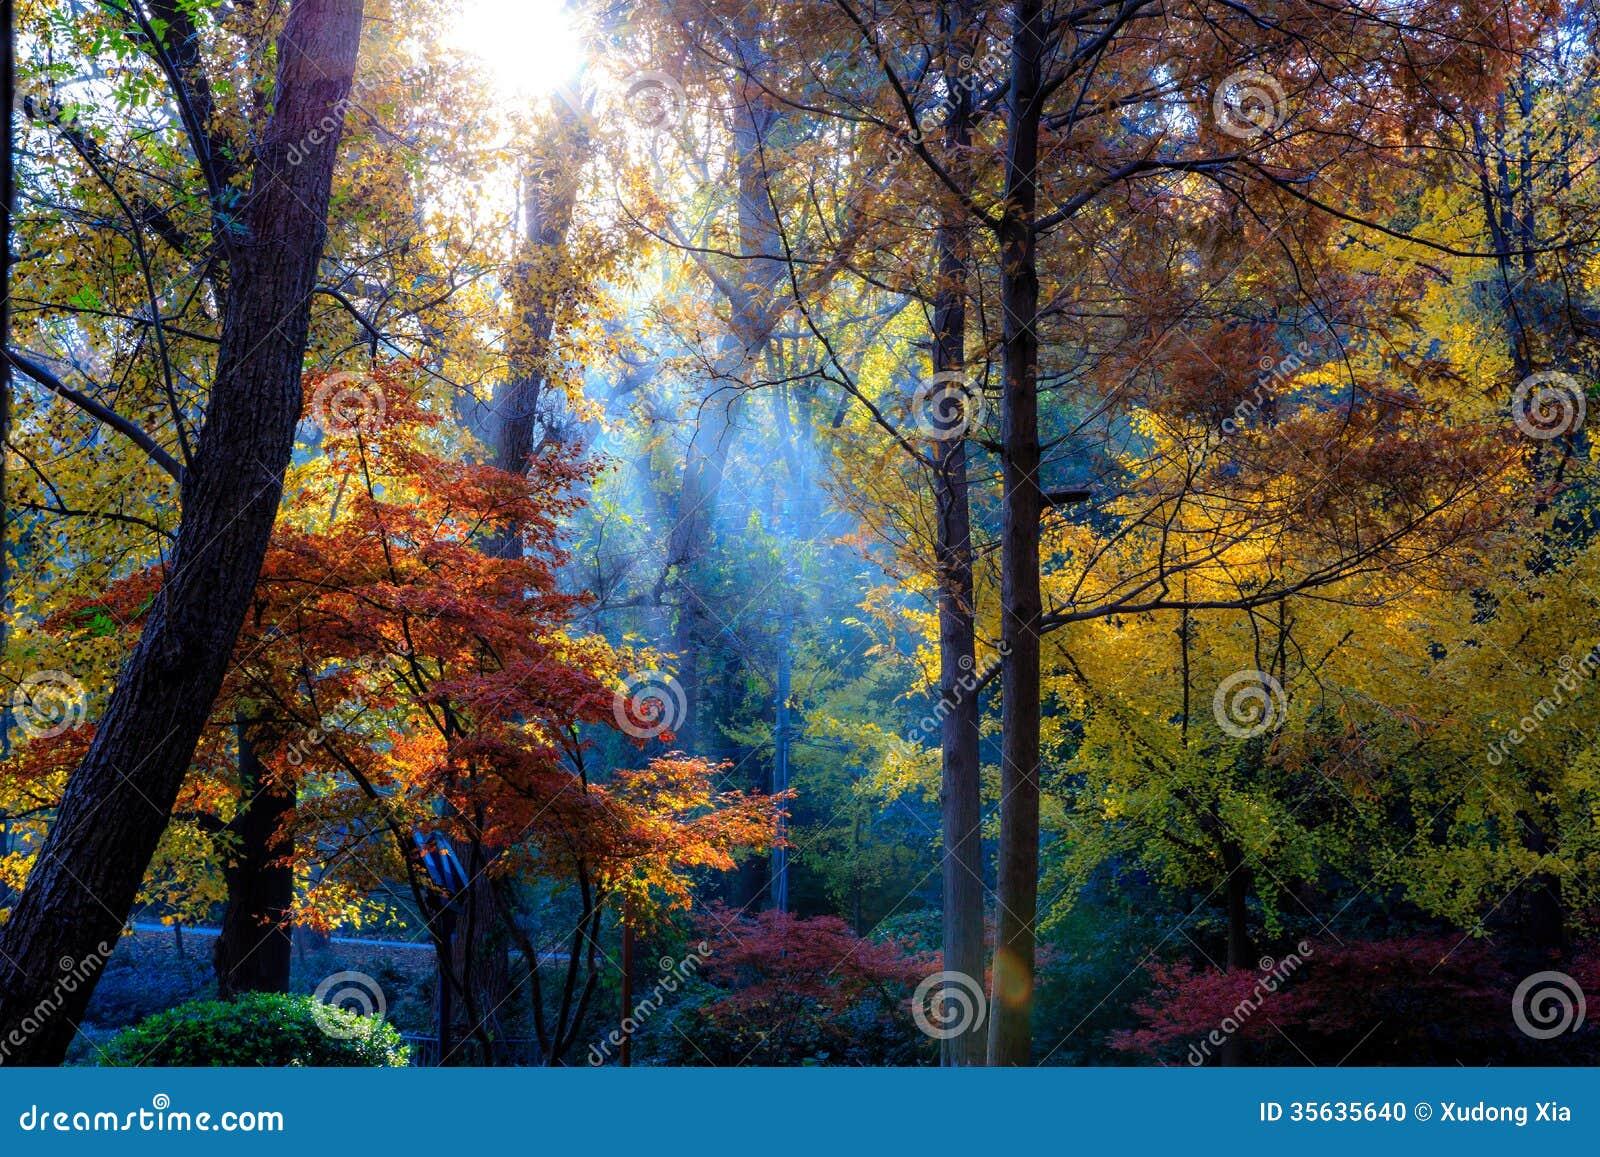 Morning in Autumn